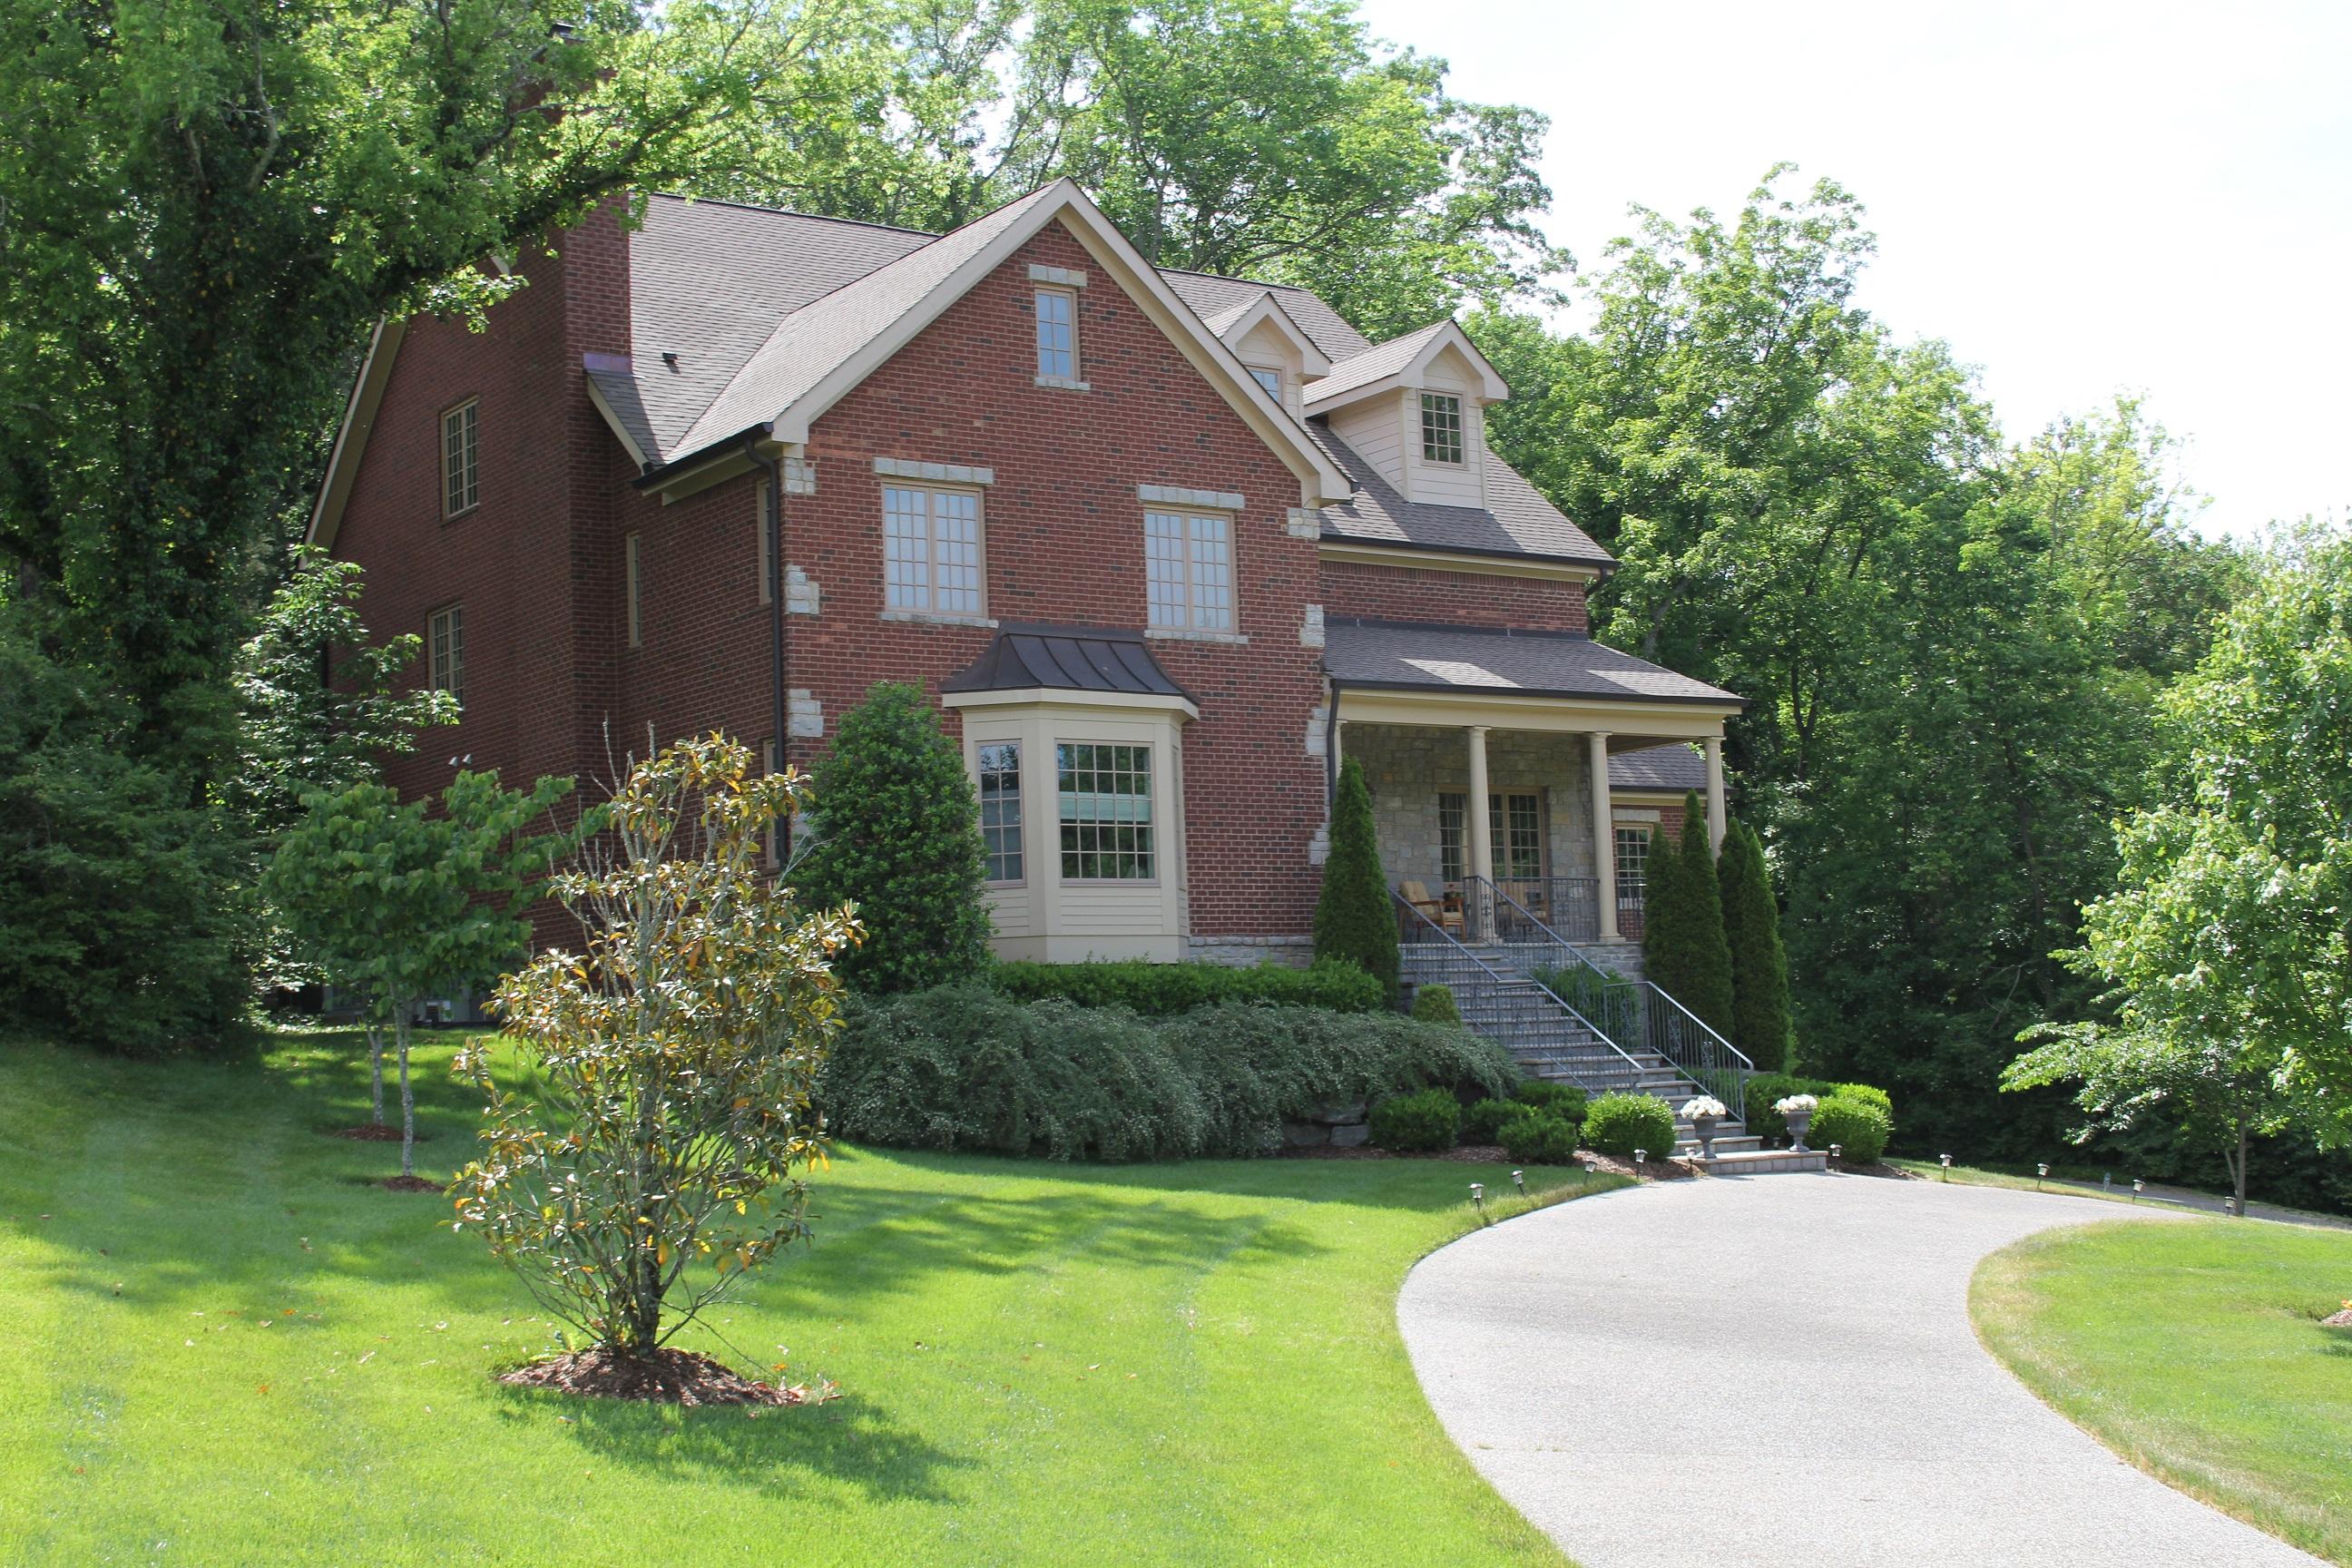 New Home on Wayland Drive